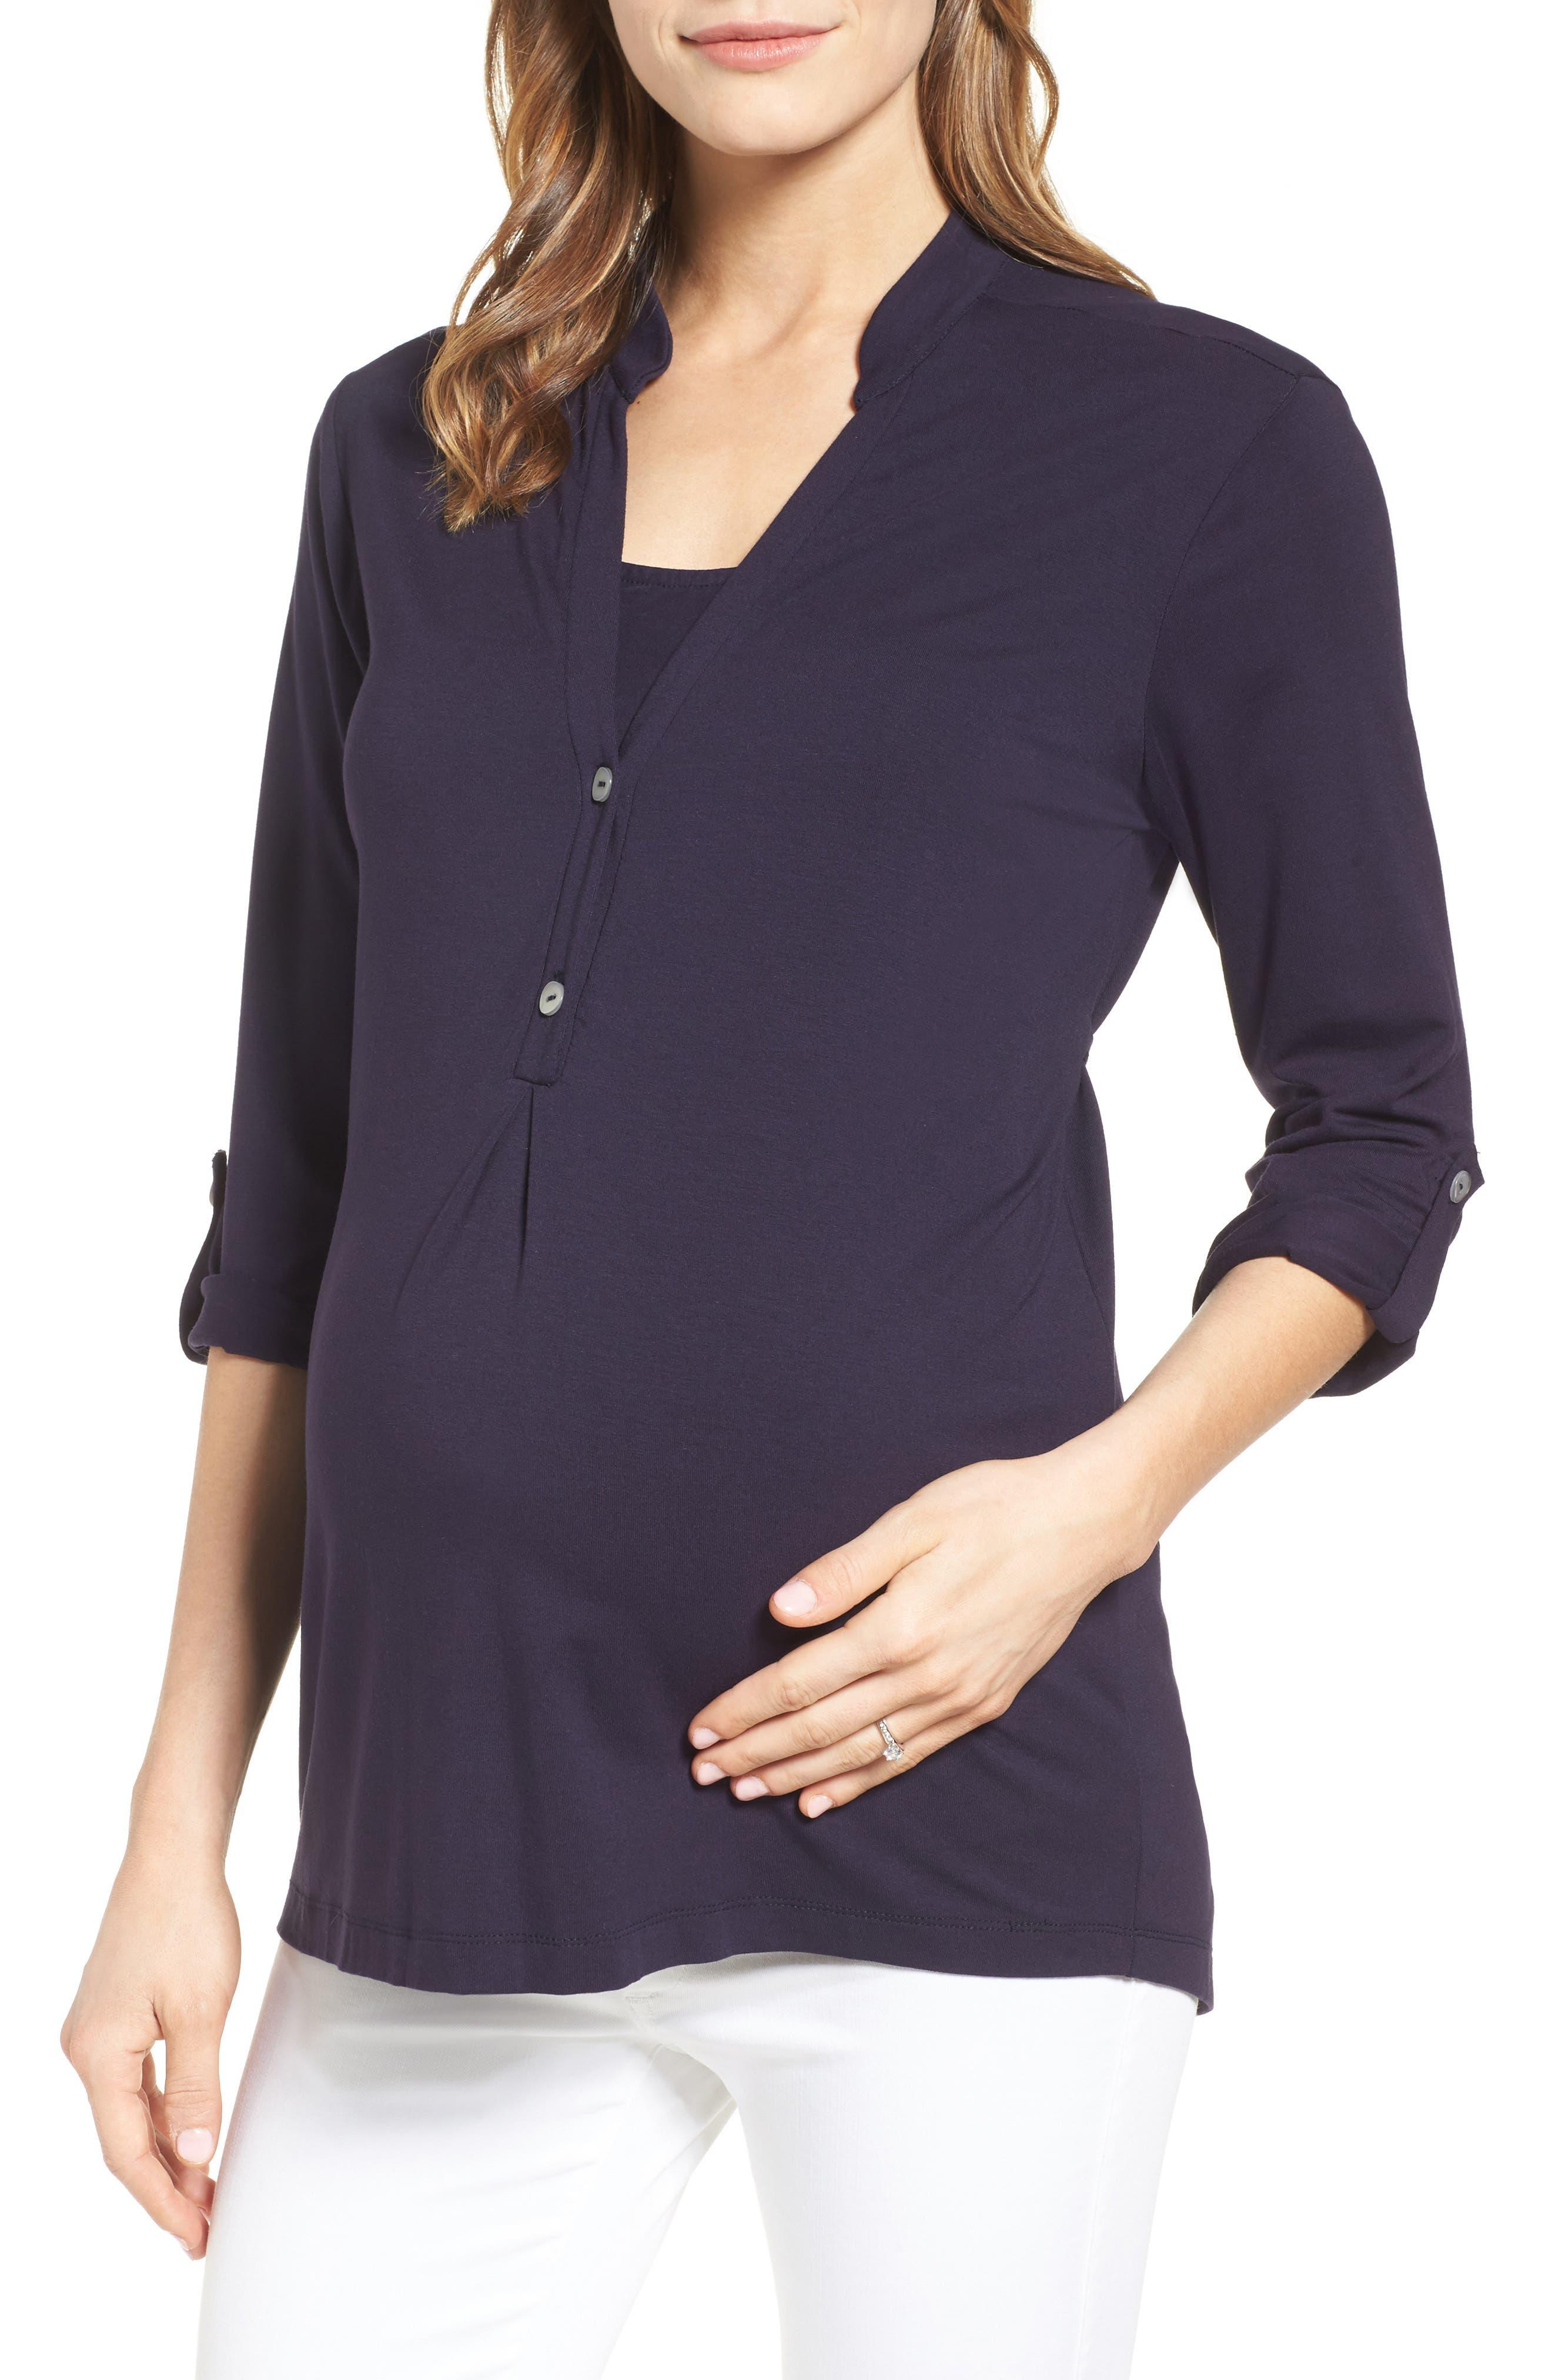 Isabella Oliver Lawson Maternity/Nursing Top